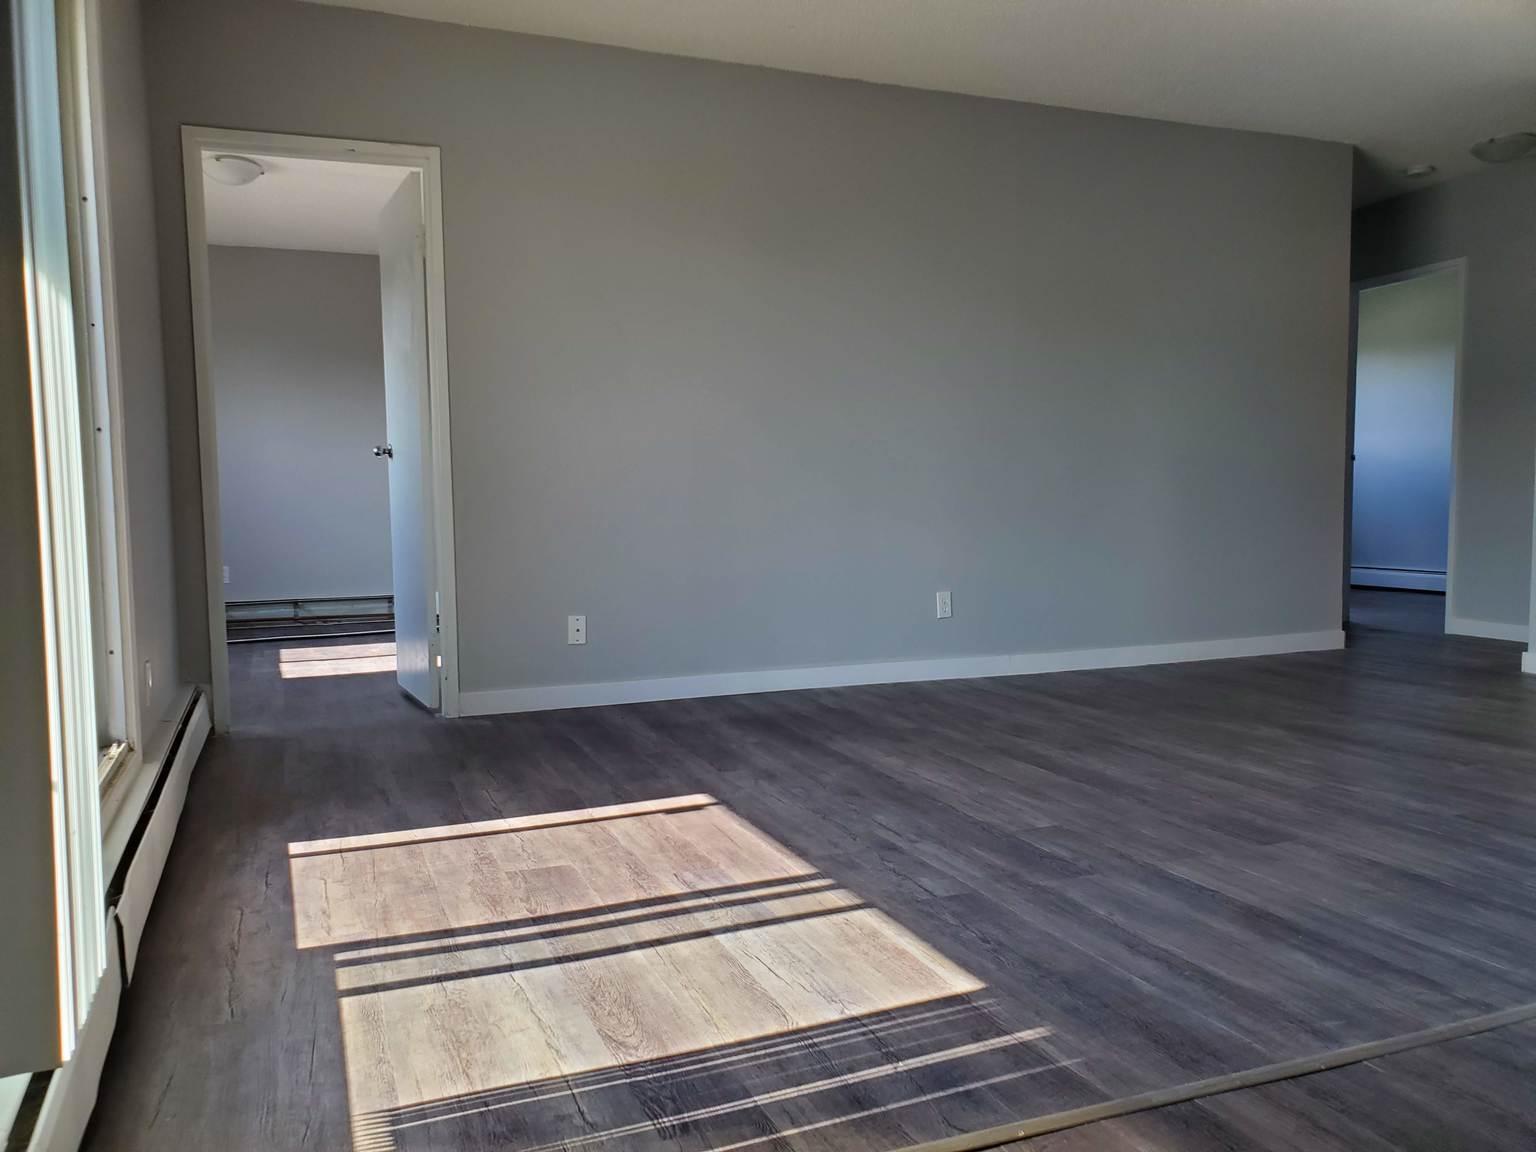 710 Appleby Dr, Saskatoon, SK - $875